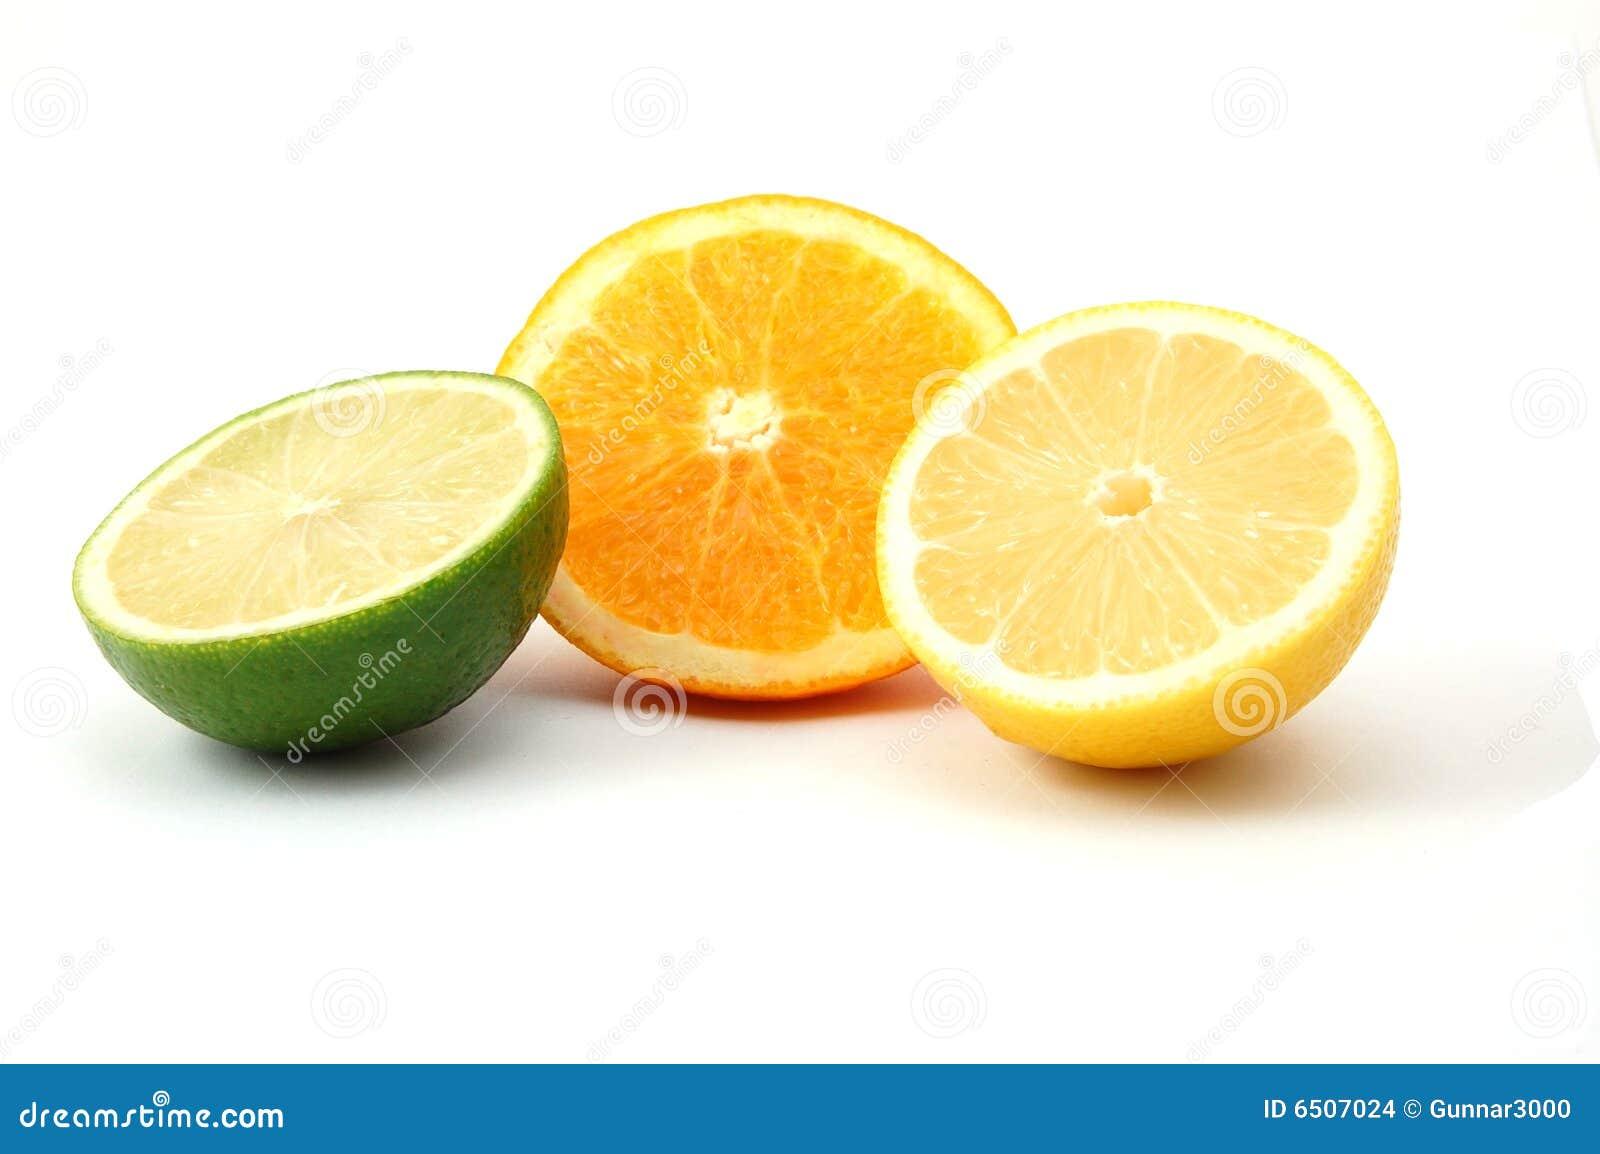 Lemon Orange And Citro... Quarter Lemon